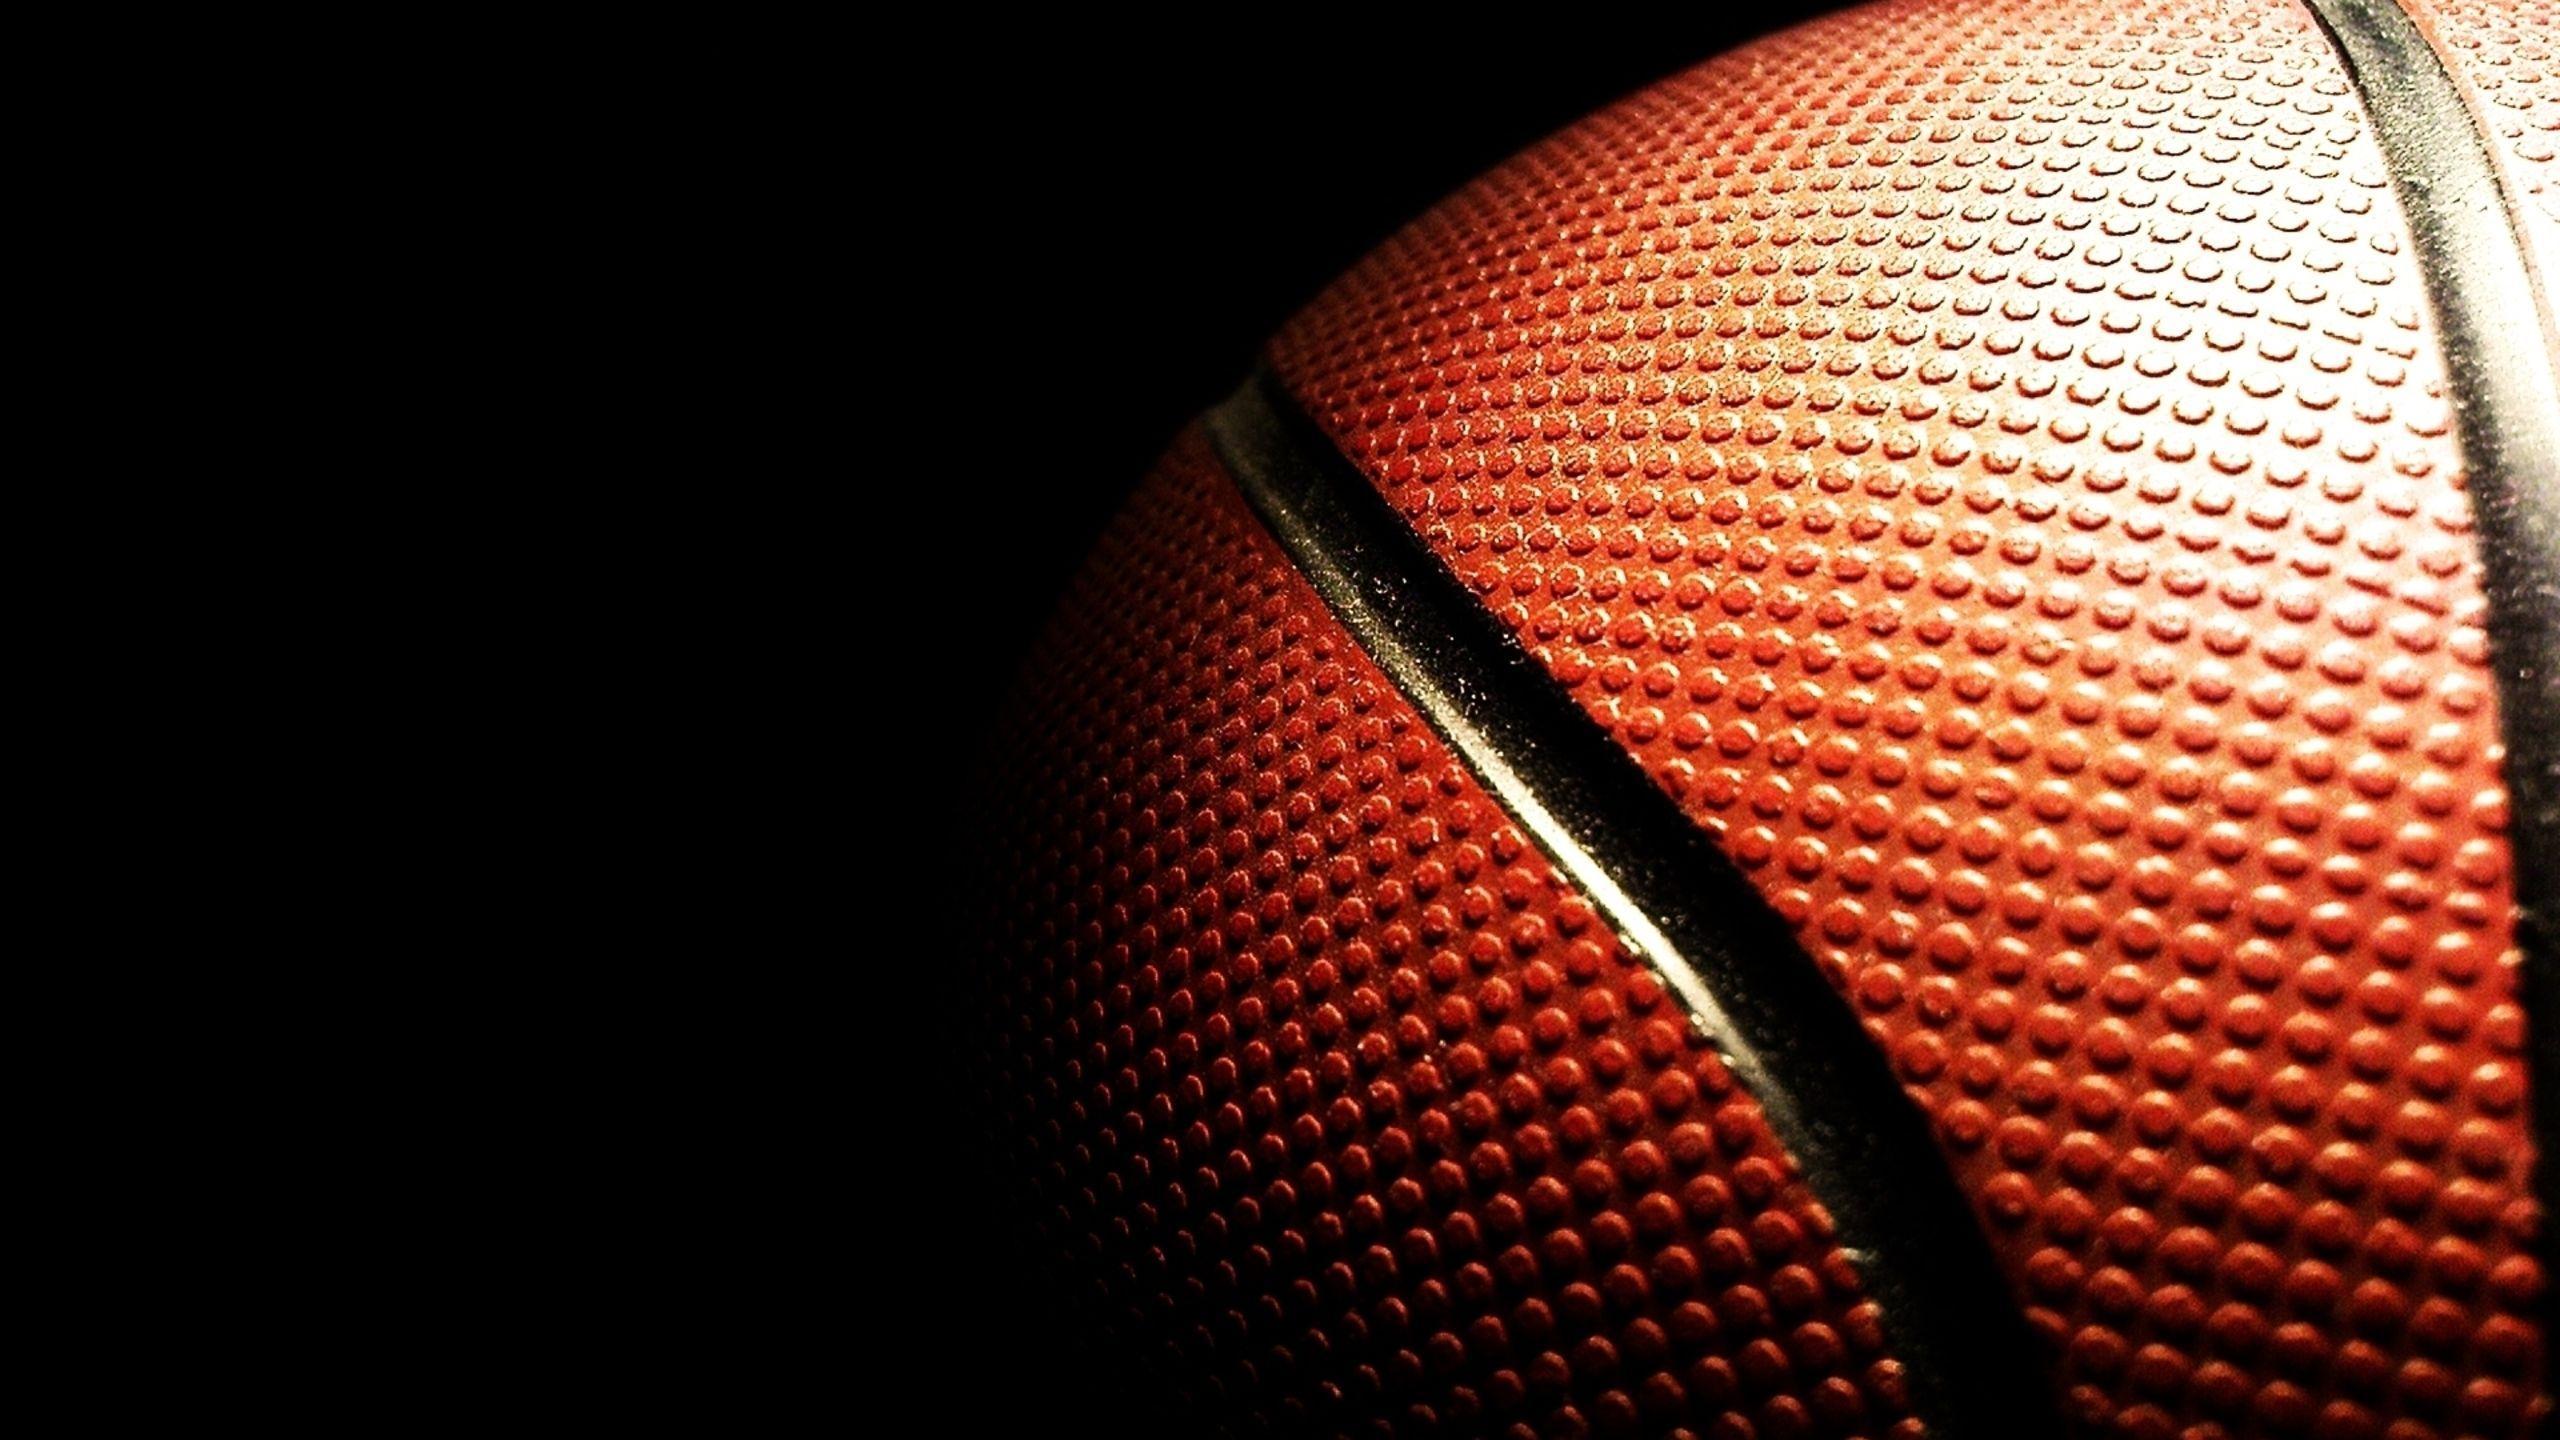 2560x1440 Basketball Wallpapers Top Free 2560x1440 Basketball Backgrounds Wallpaperaccess